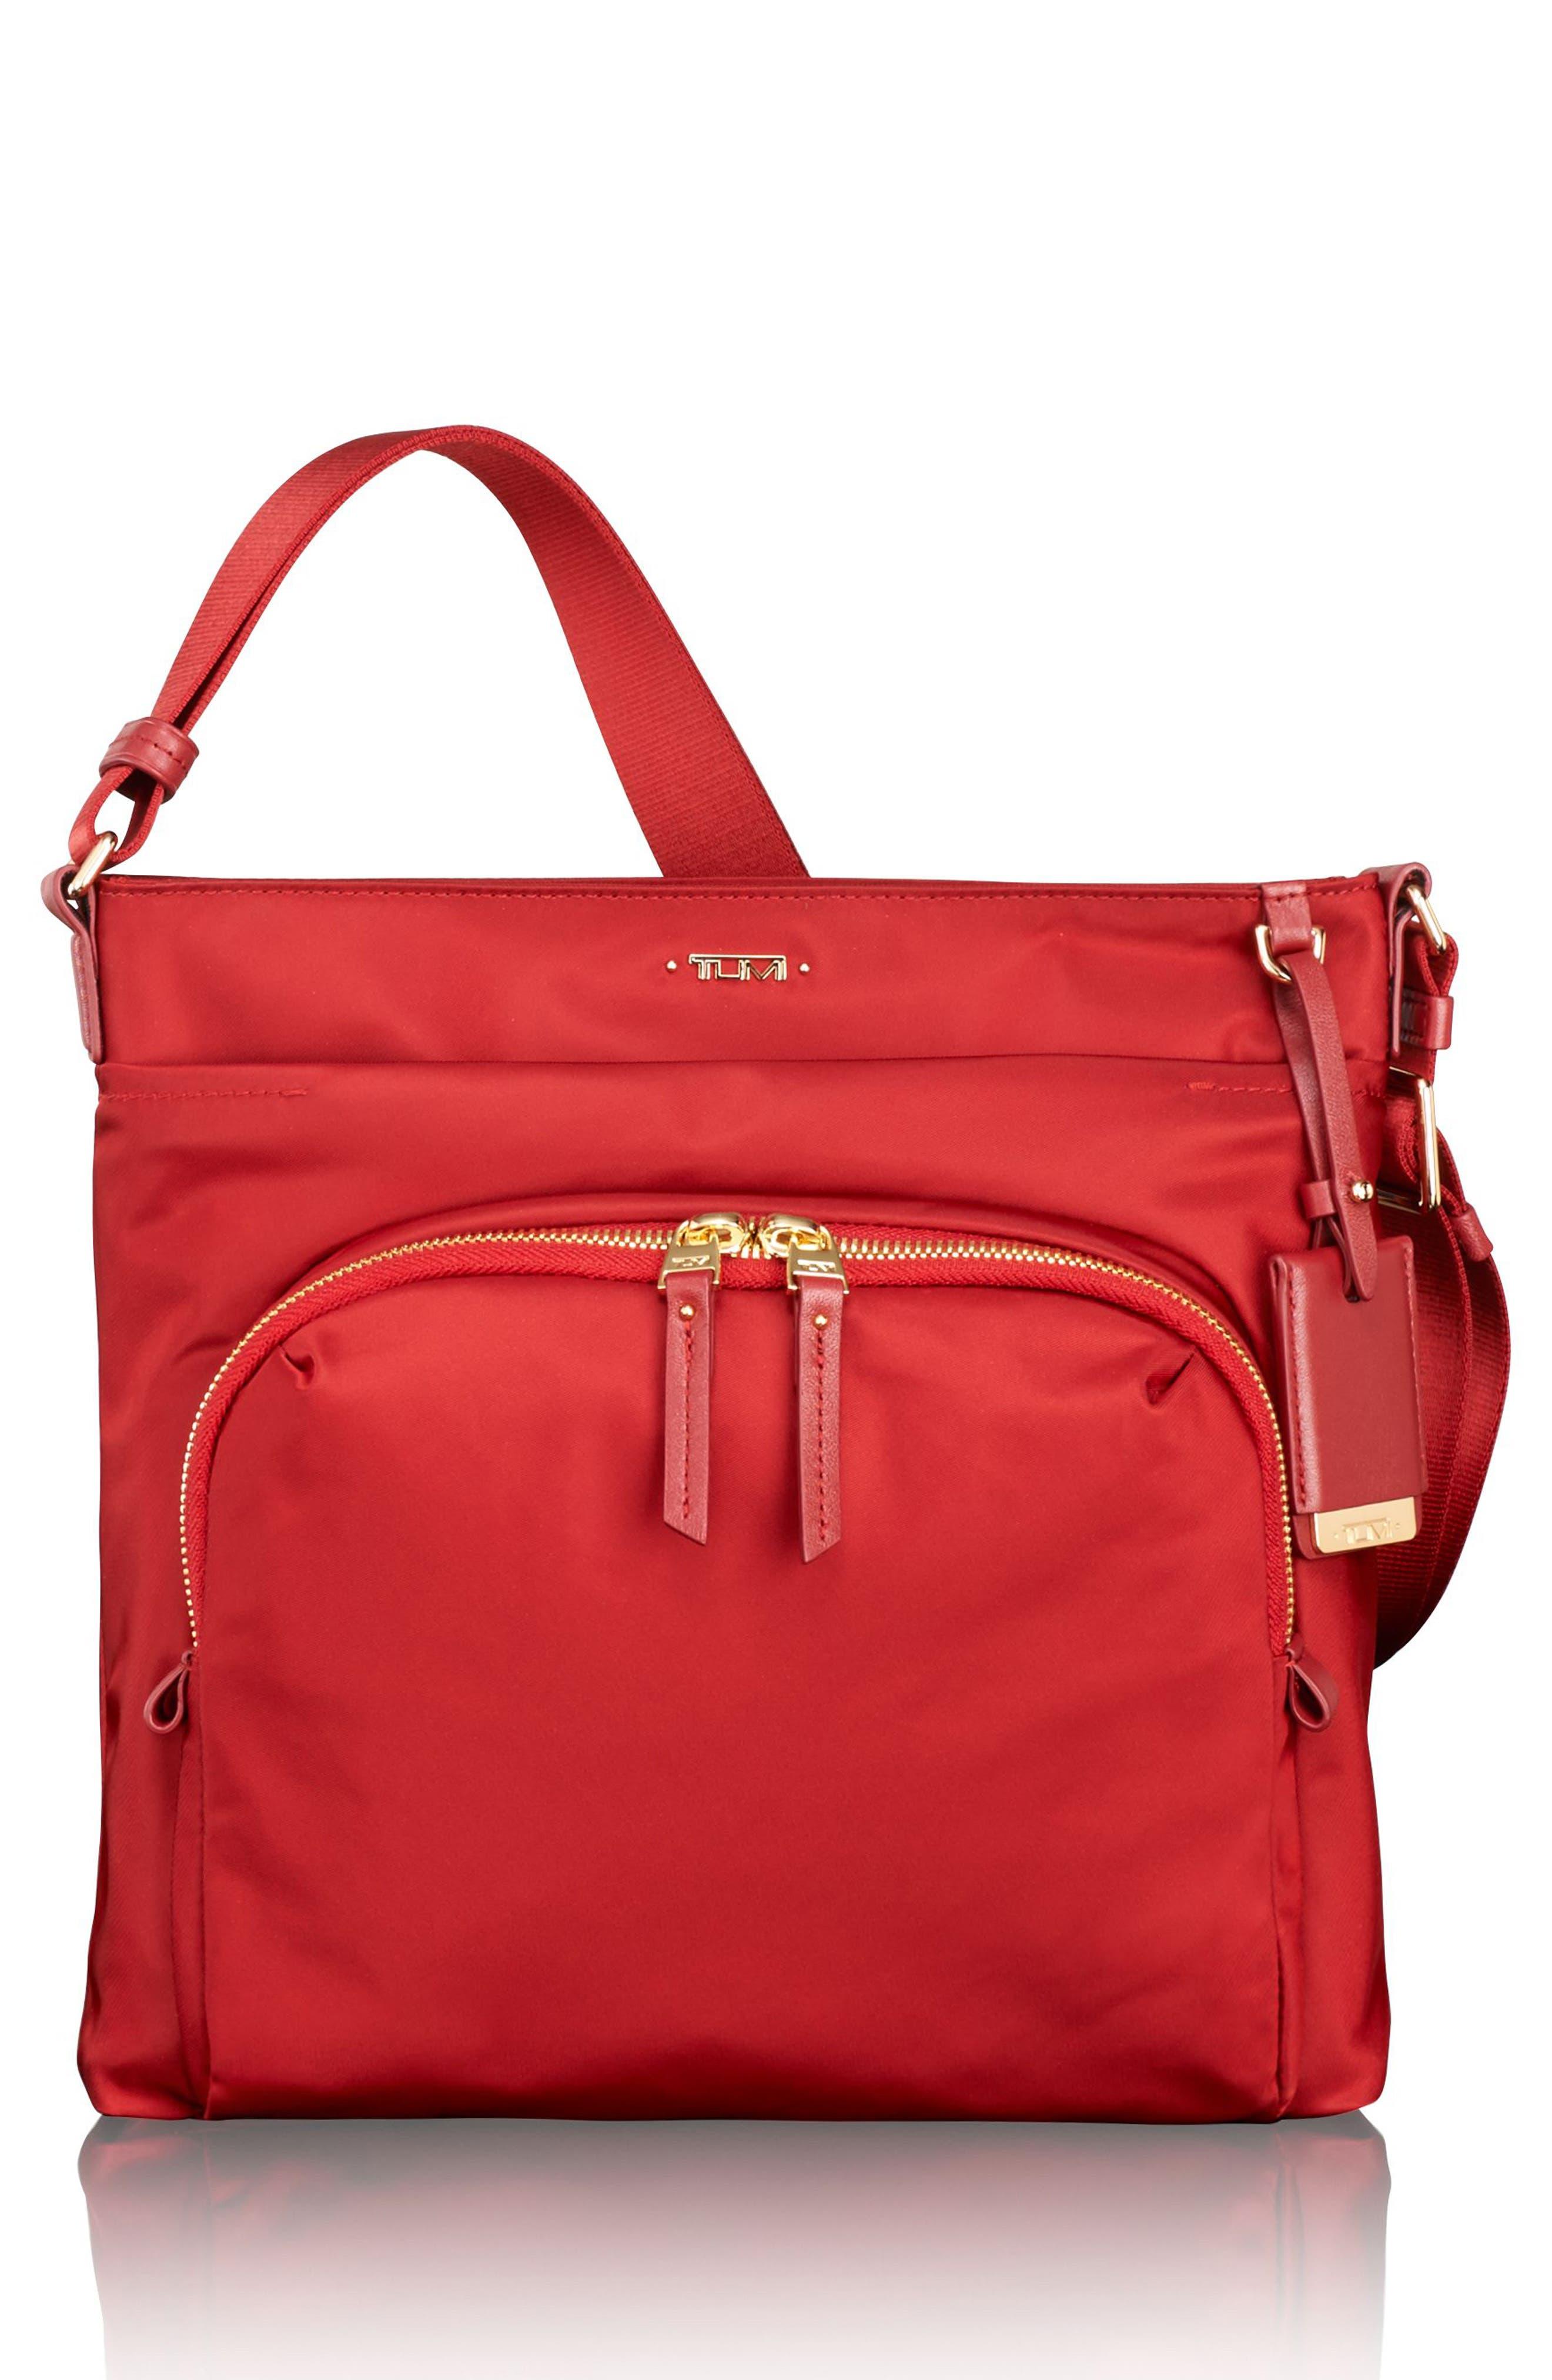 Main Image - Tumi Voyageur - Capri Nylon Crossbody Bag